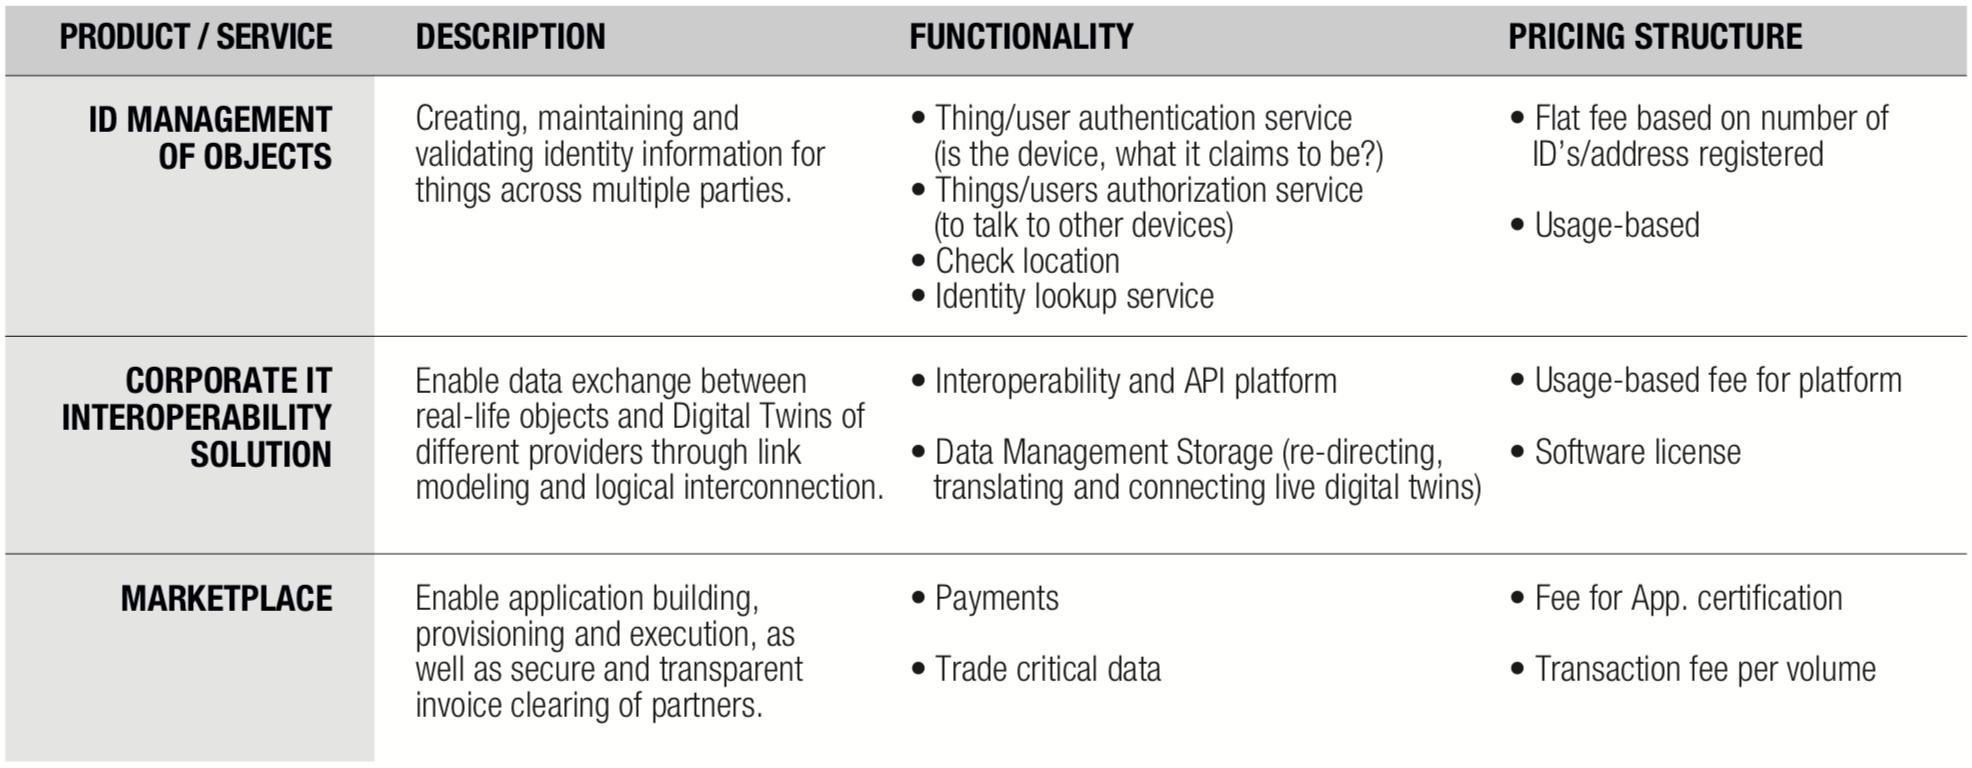 Detailed Description of the Identity Management Model